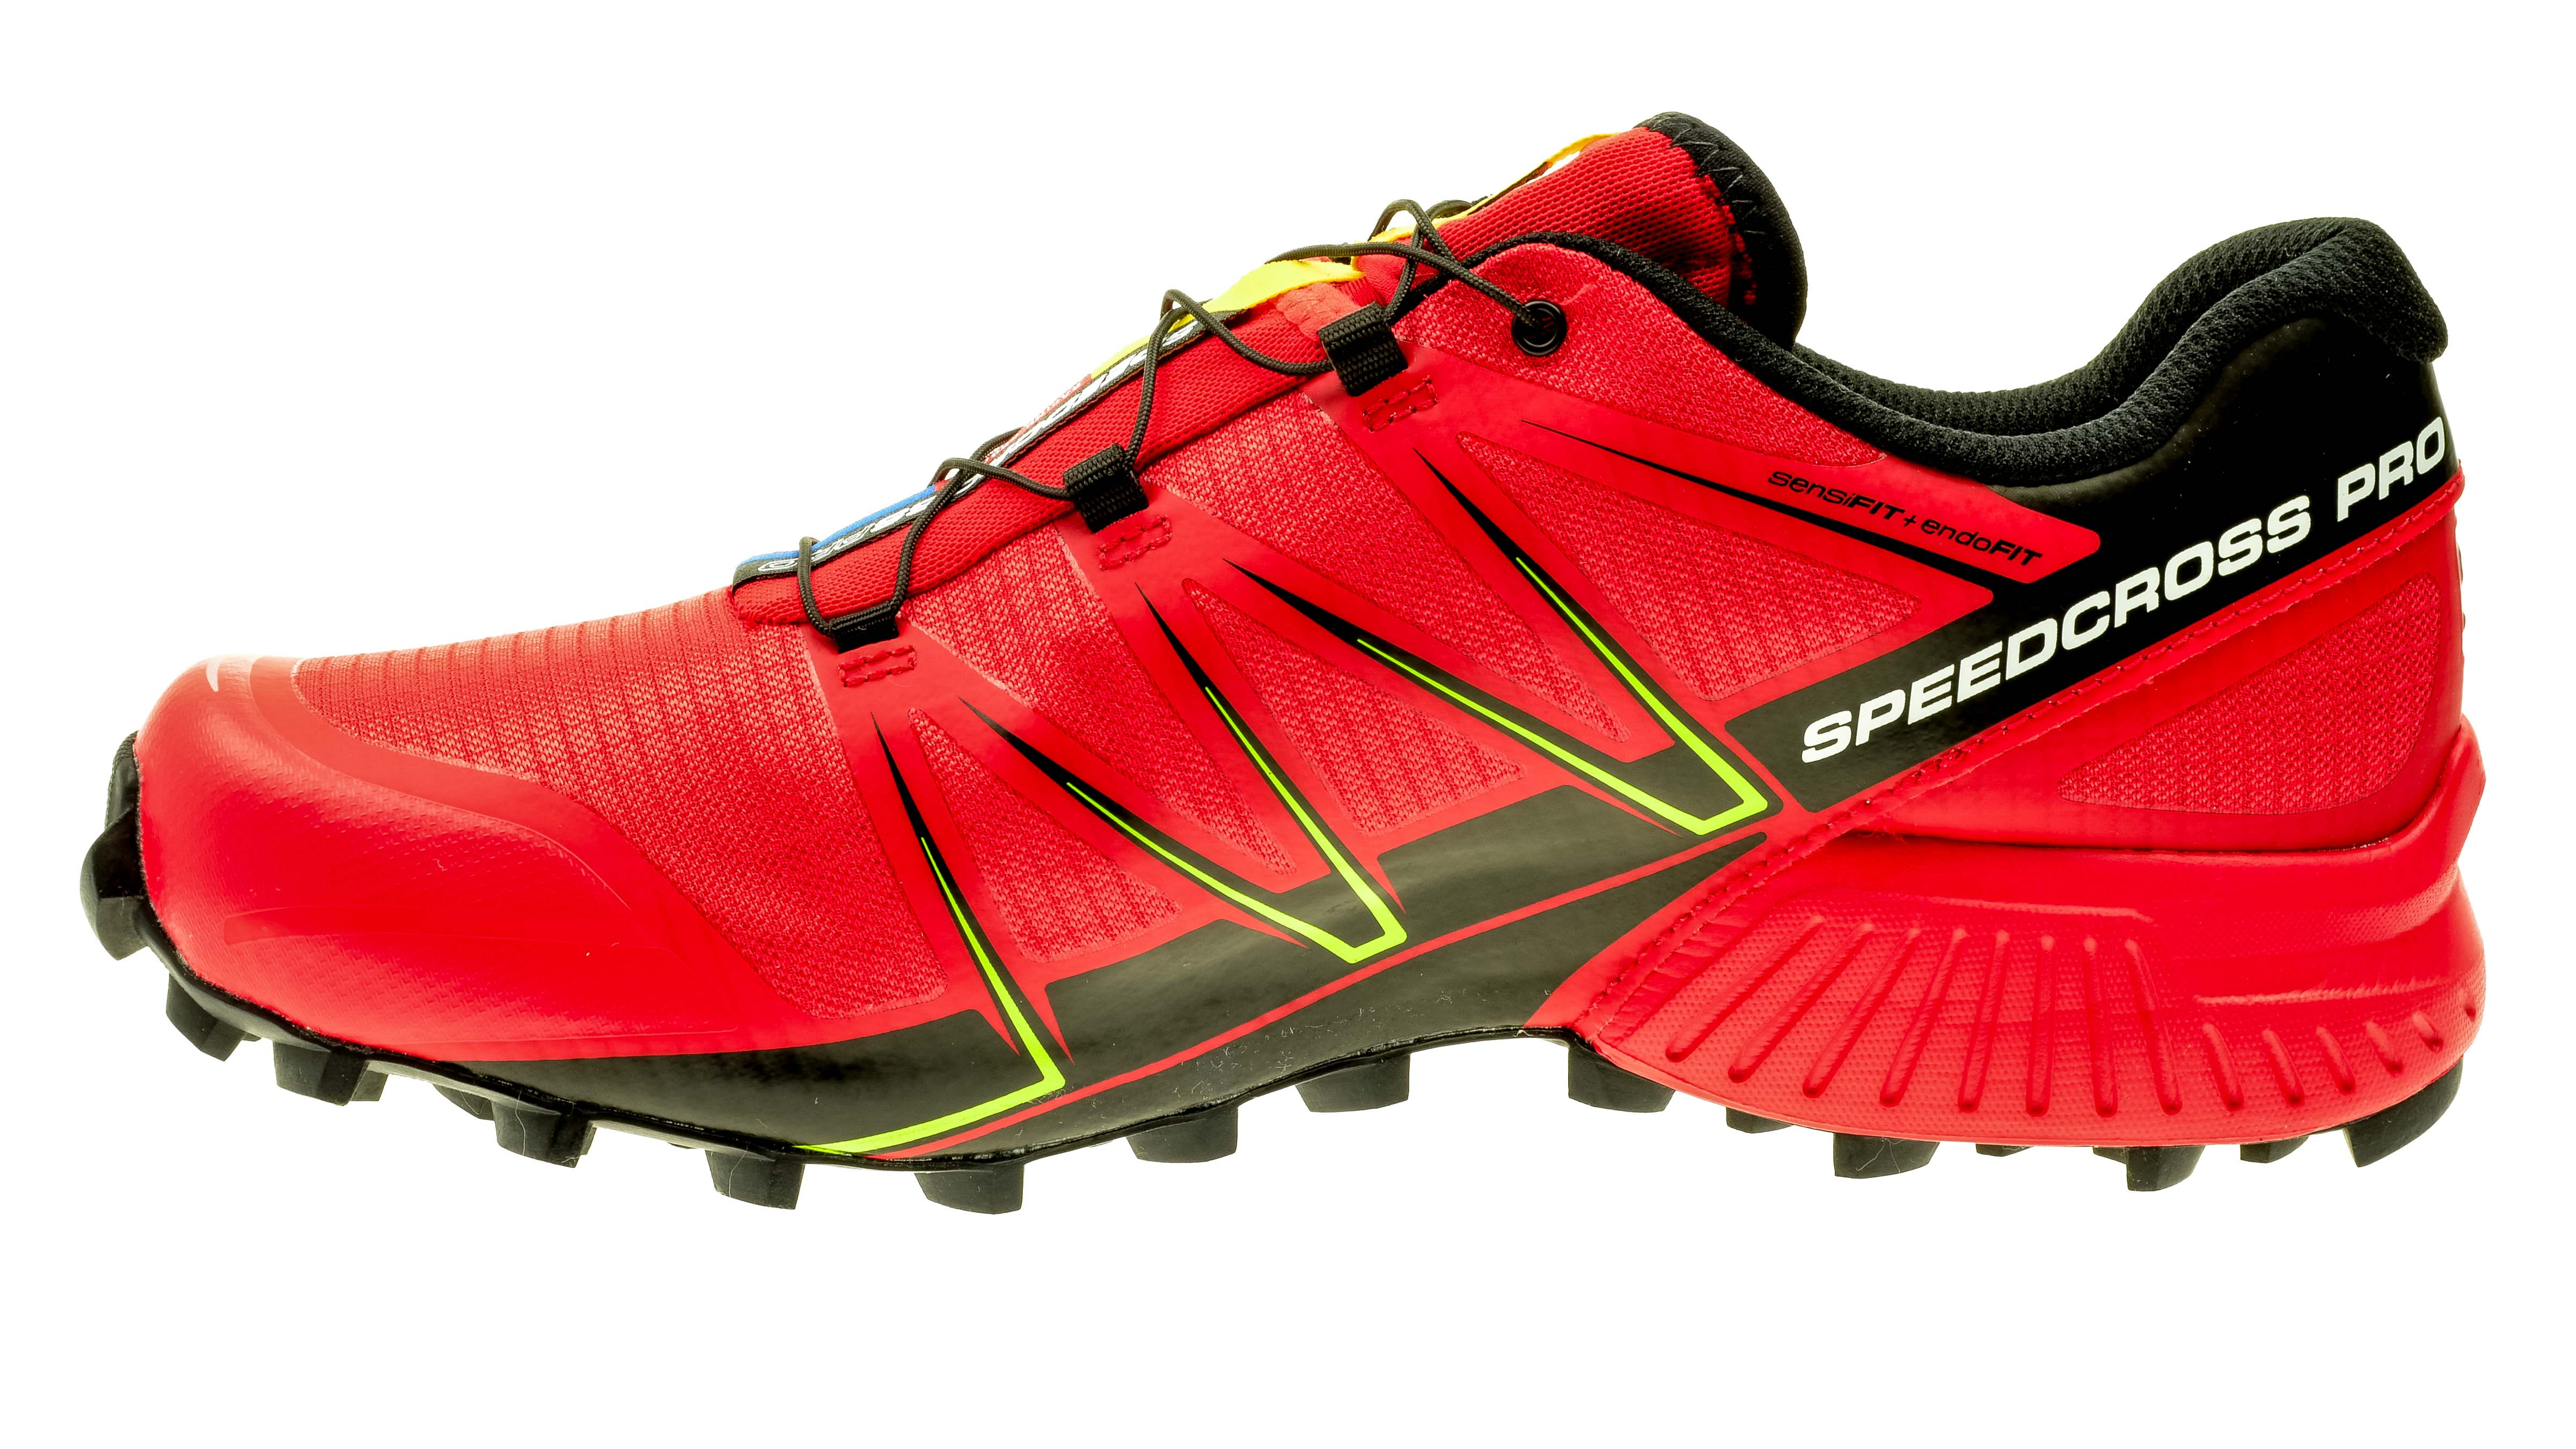 10 Reasons toNOT to Buy Salomon Speedcross Pro (Jan 2020